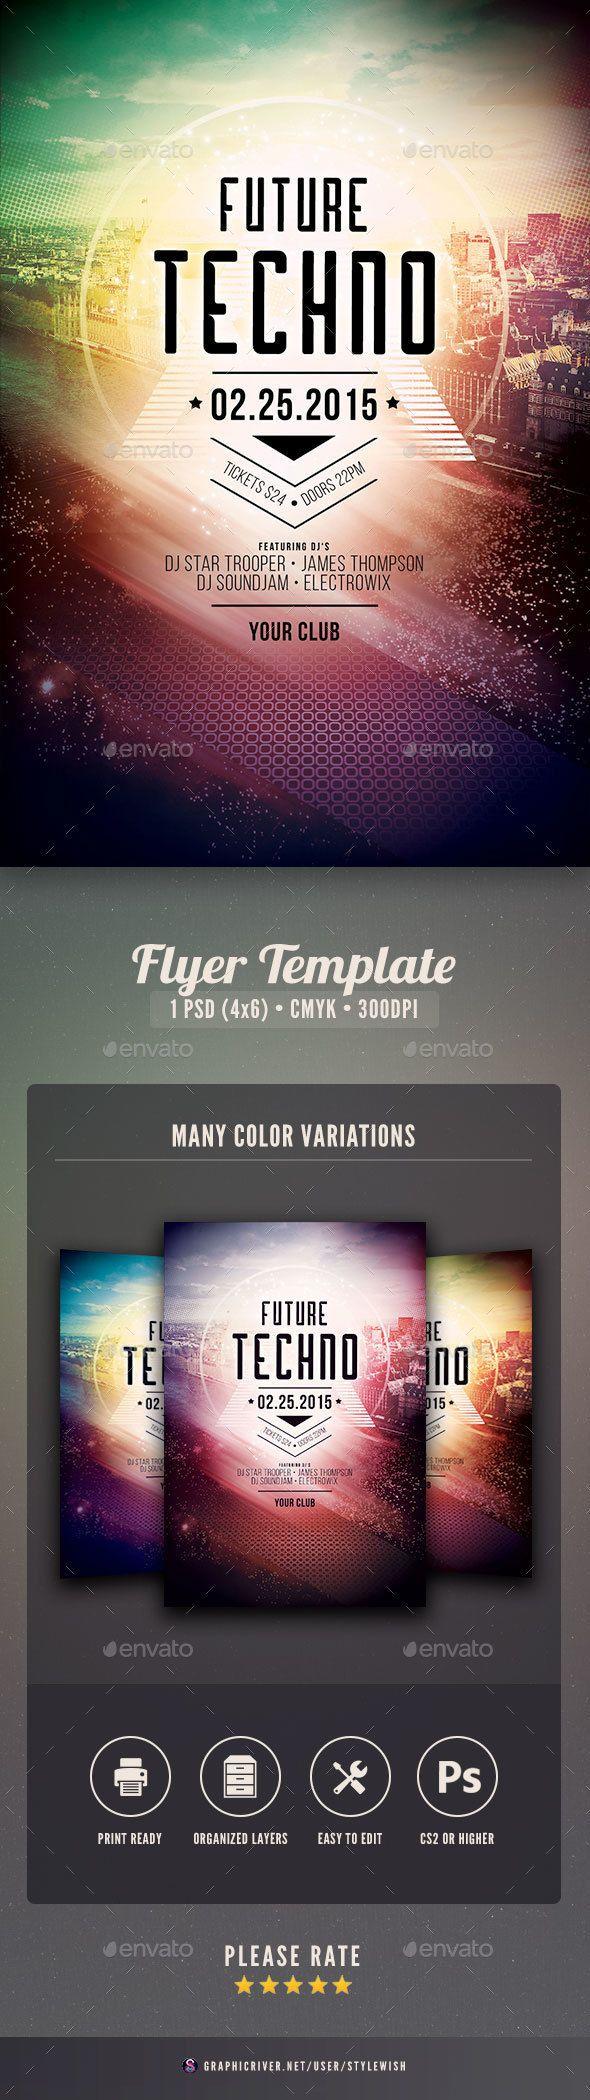 Future Techno Flyer | Techno, Flyer design templates and Concert flyer